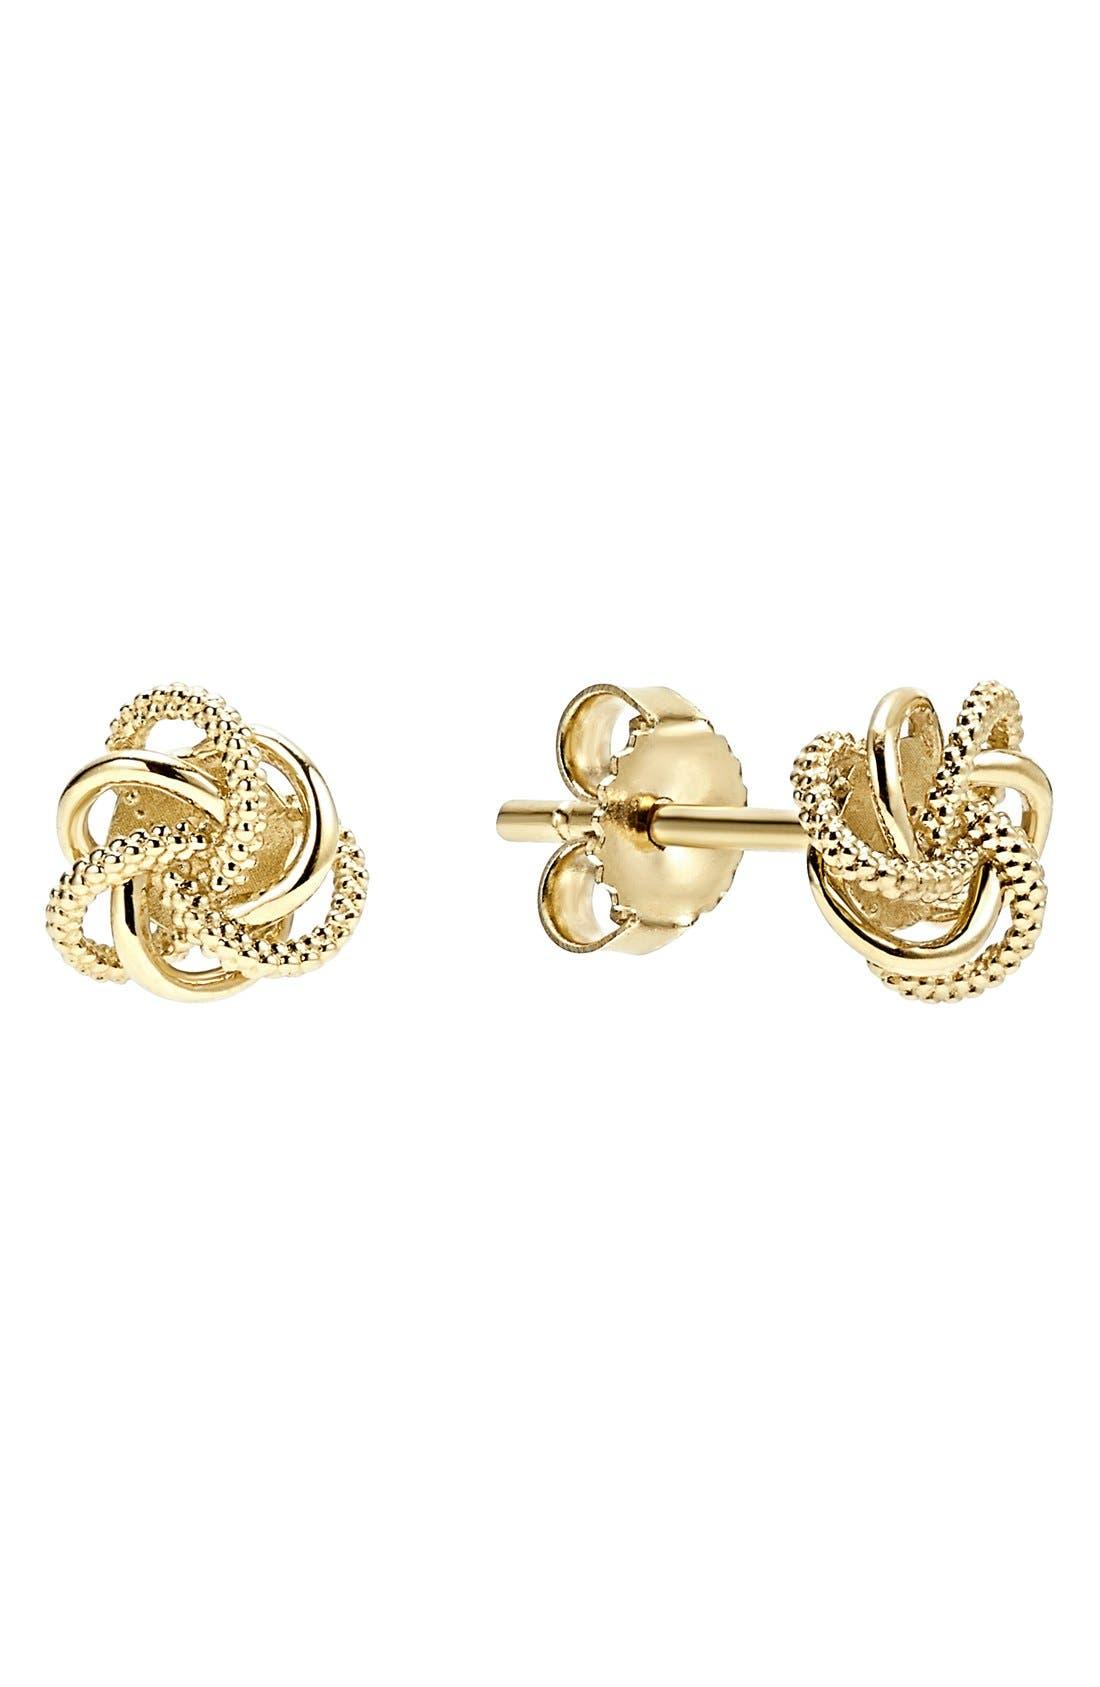 Lagos 'Love Knot' Stud Earrings